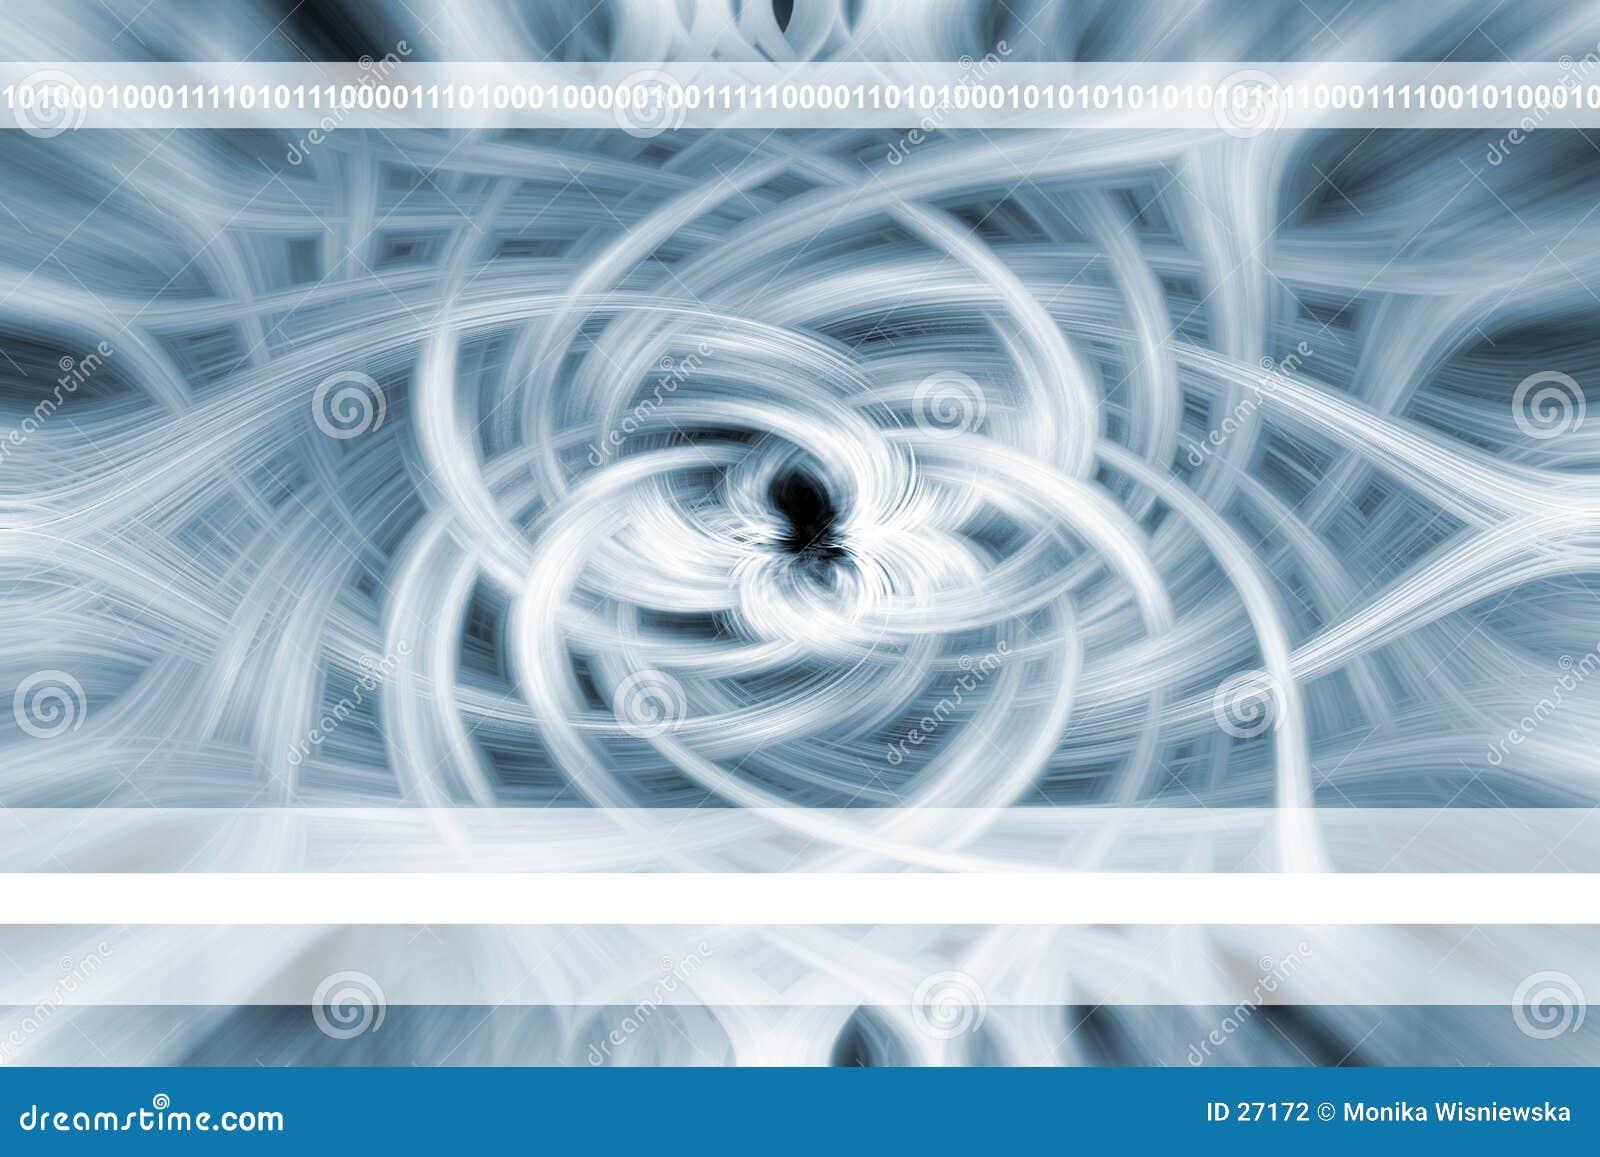 Abstracte Bloem - Achtergrond